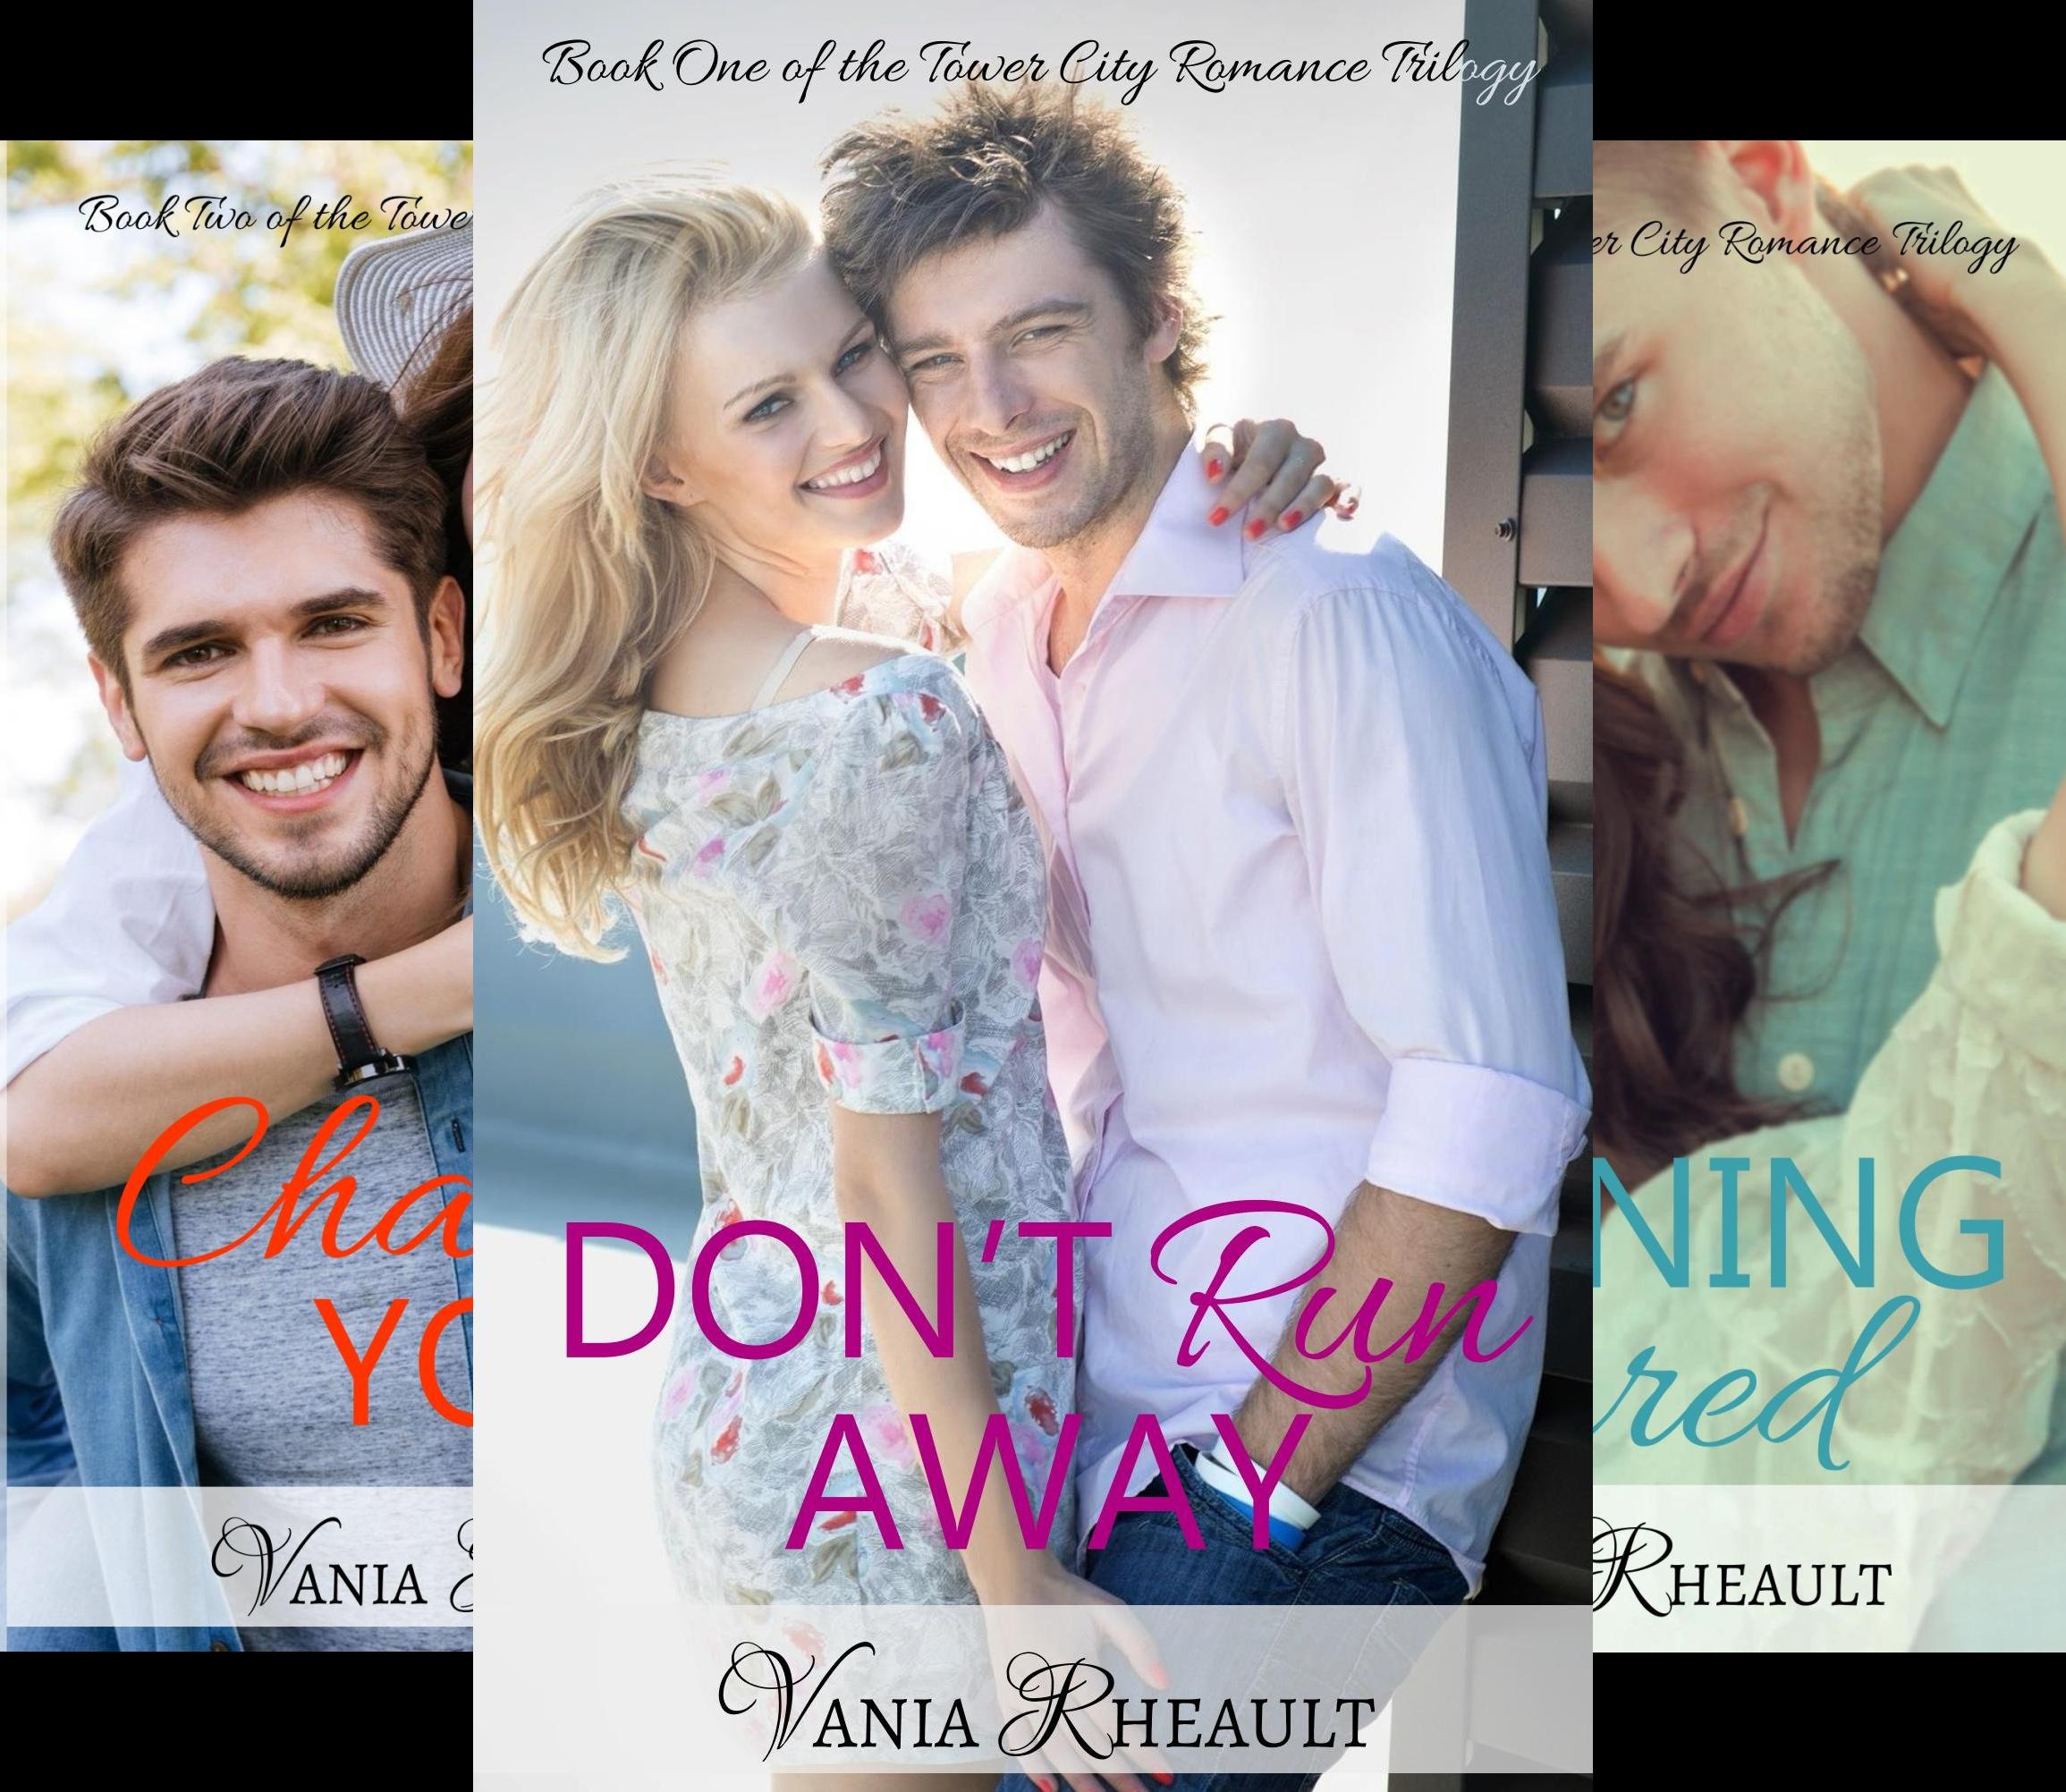 Tower City Romance Trilogy (3 Book Series)